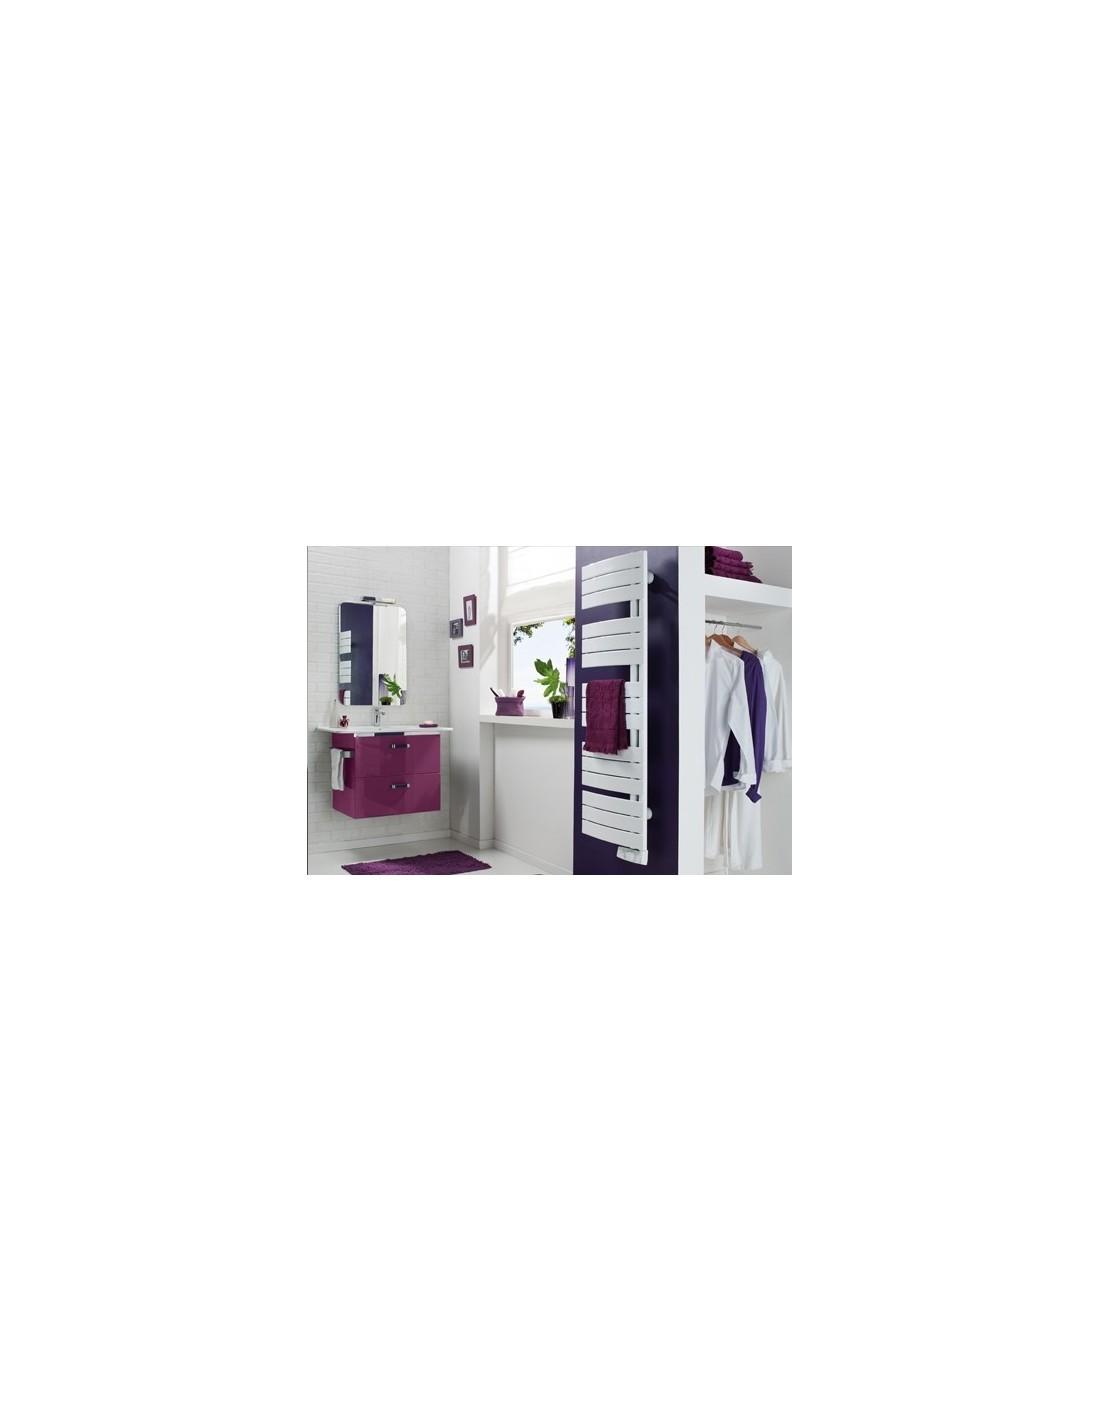 s che serviettes nefertiti integral troit pivotant 1750w. Black Bedroom Furniture Sets. Home Design Ideas